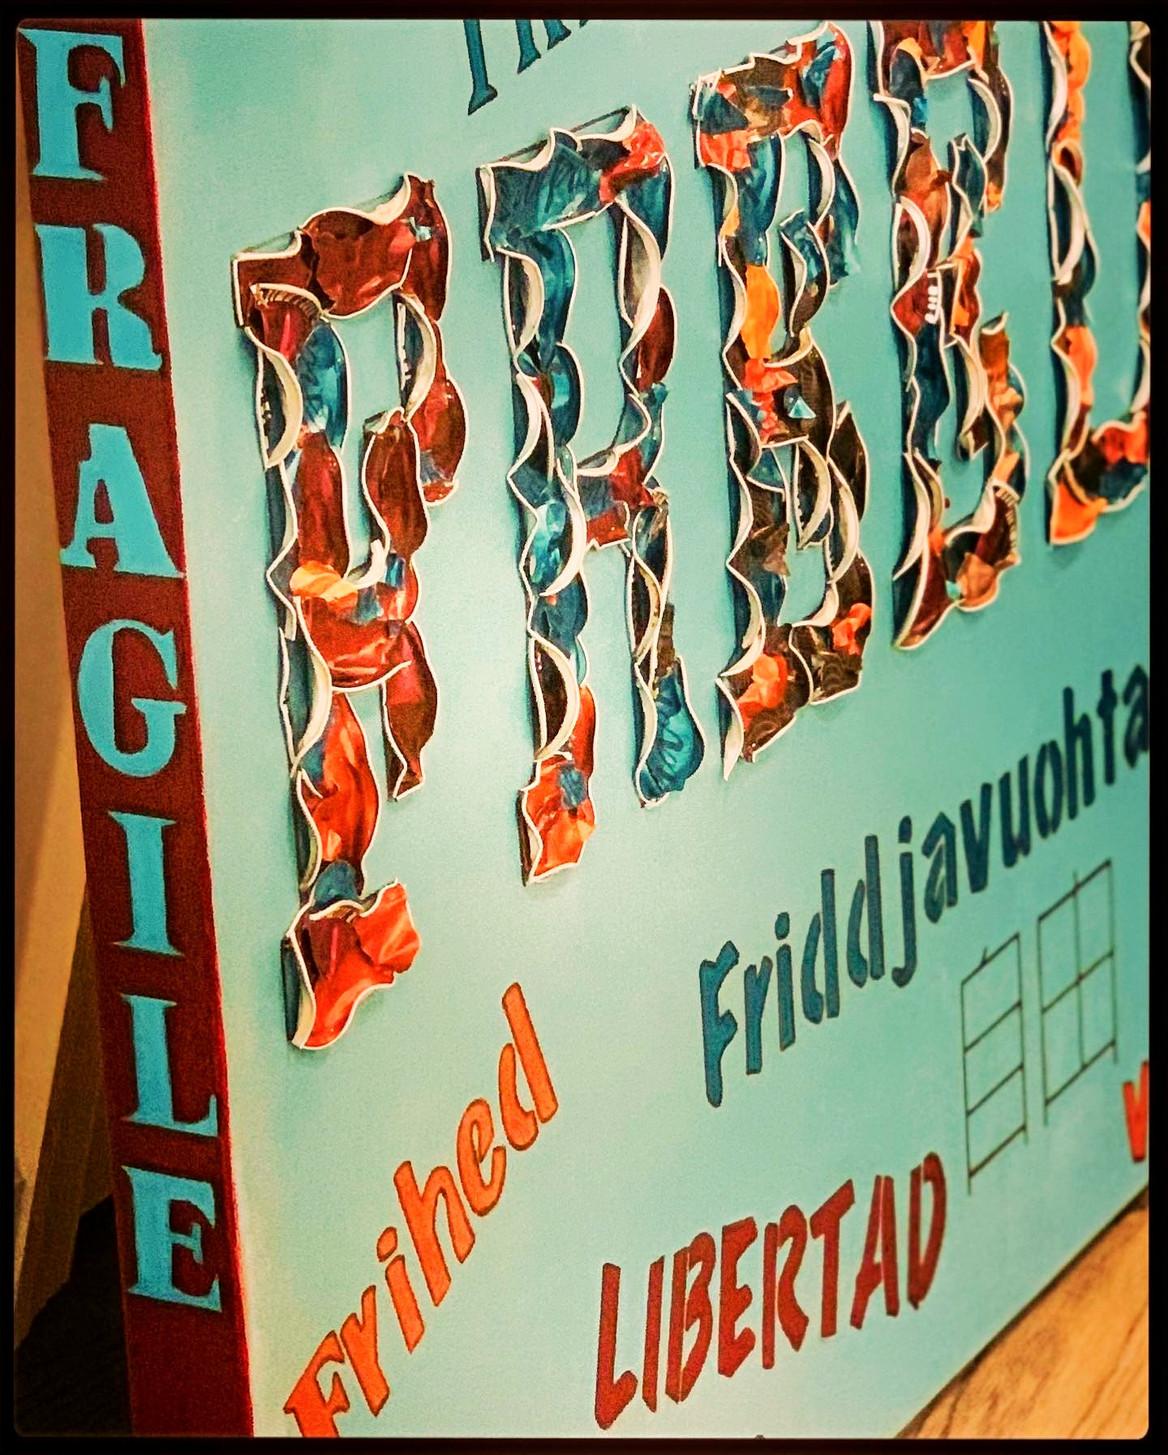 """Freedom is Fragile"" Artwork"